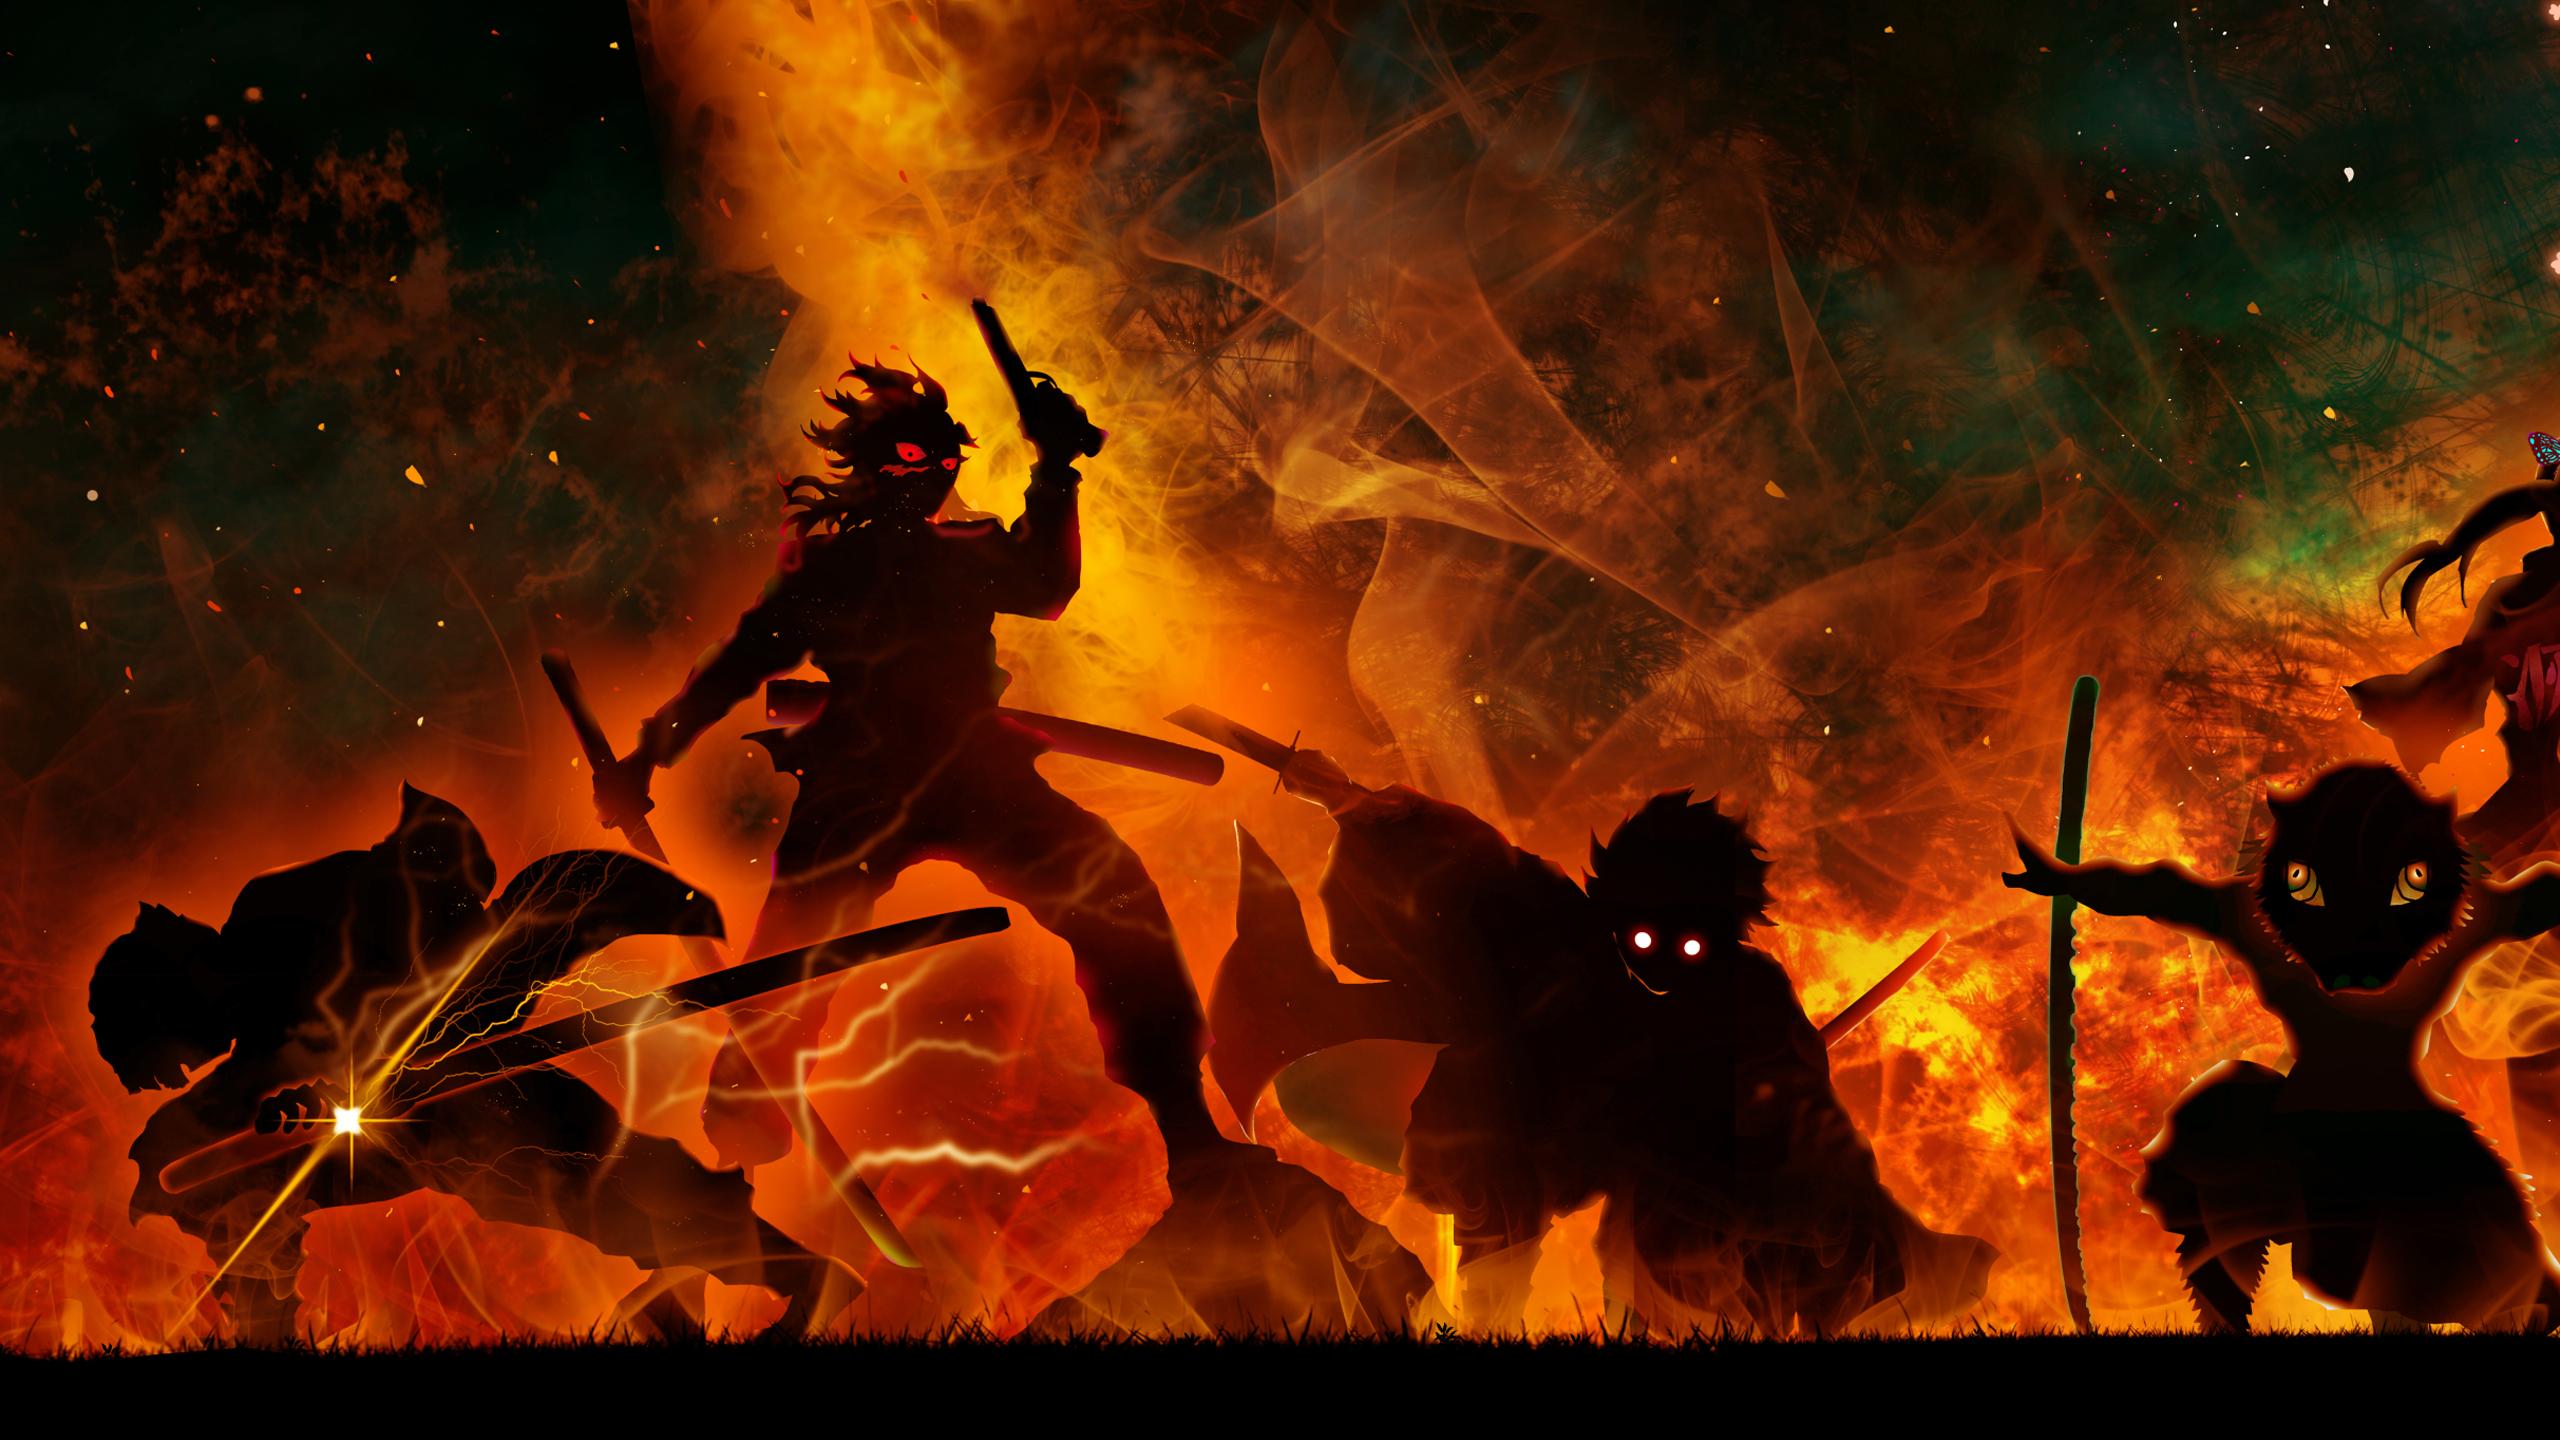 Hd wallpapers and background images demon slayer genya shinazugawa inosuke hashibira kanao ...